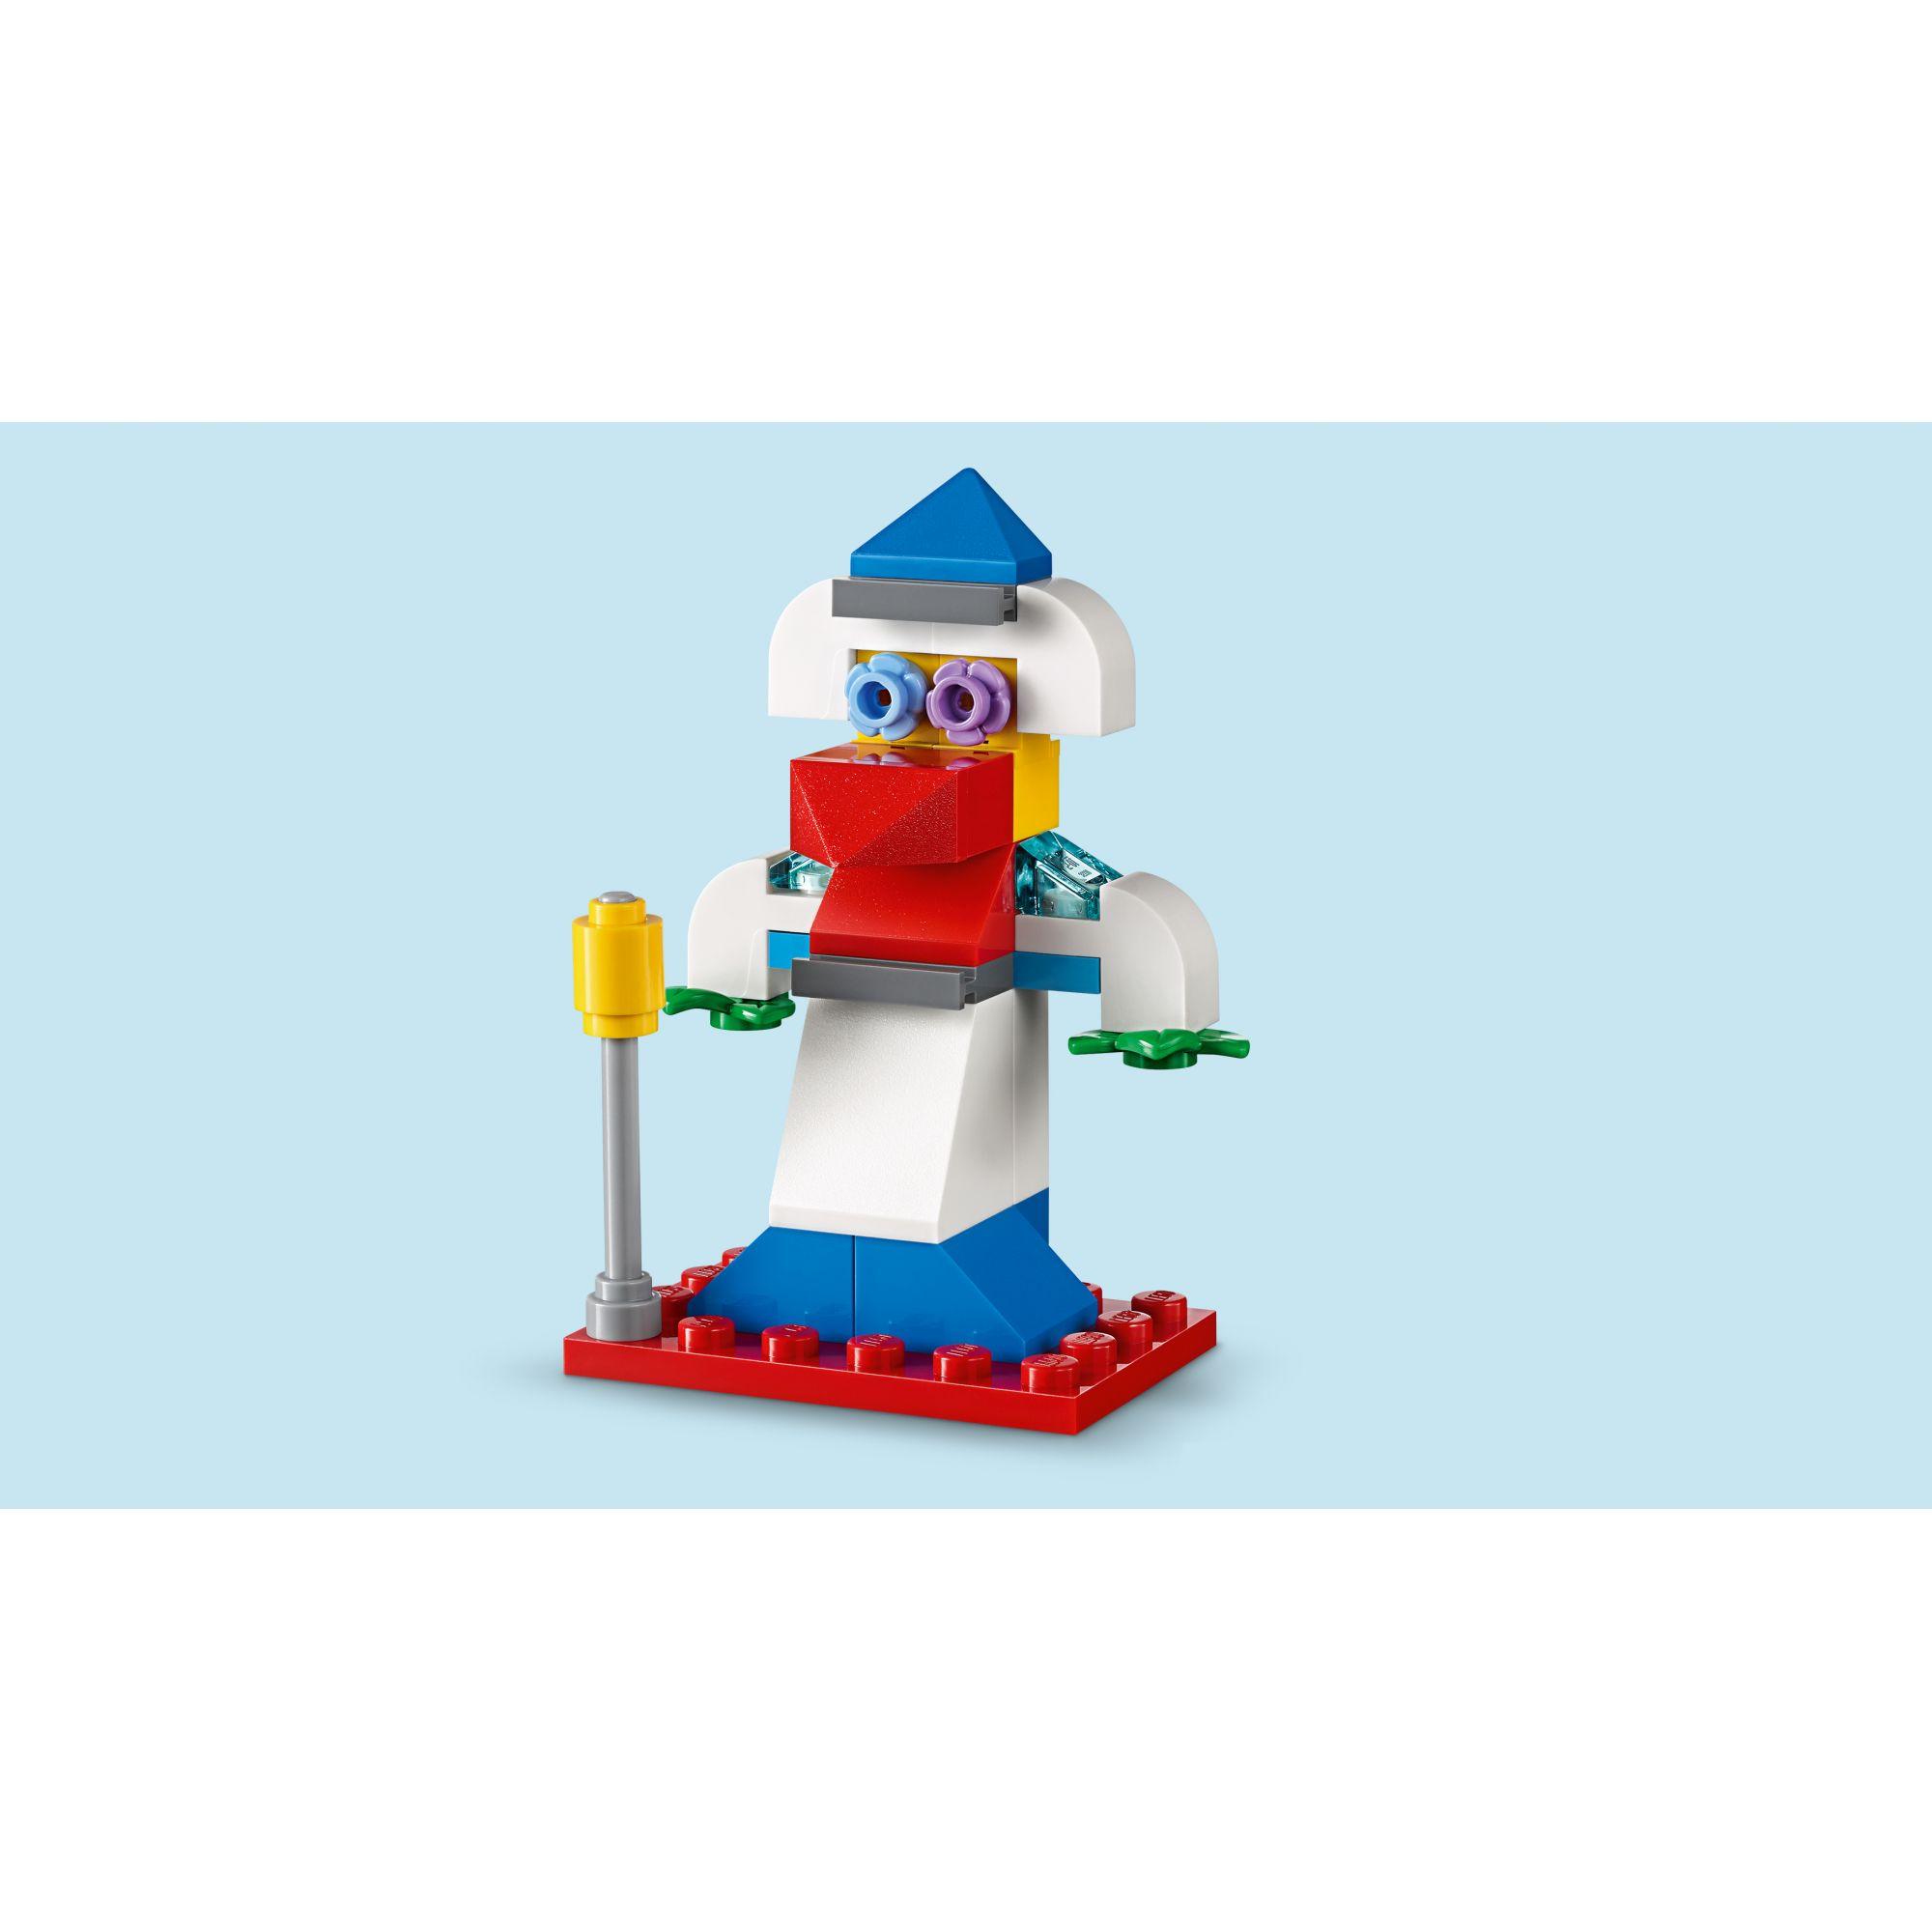 LEGO CLASSIC   LEGO Classic Mattoncini e case - 11008